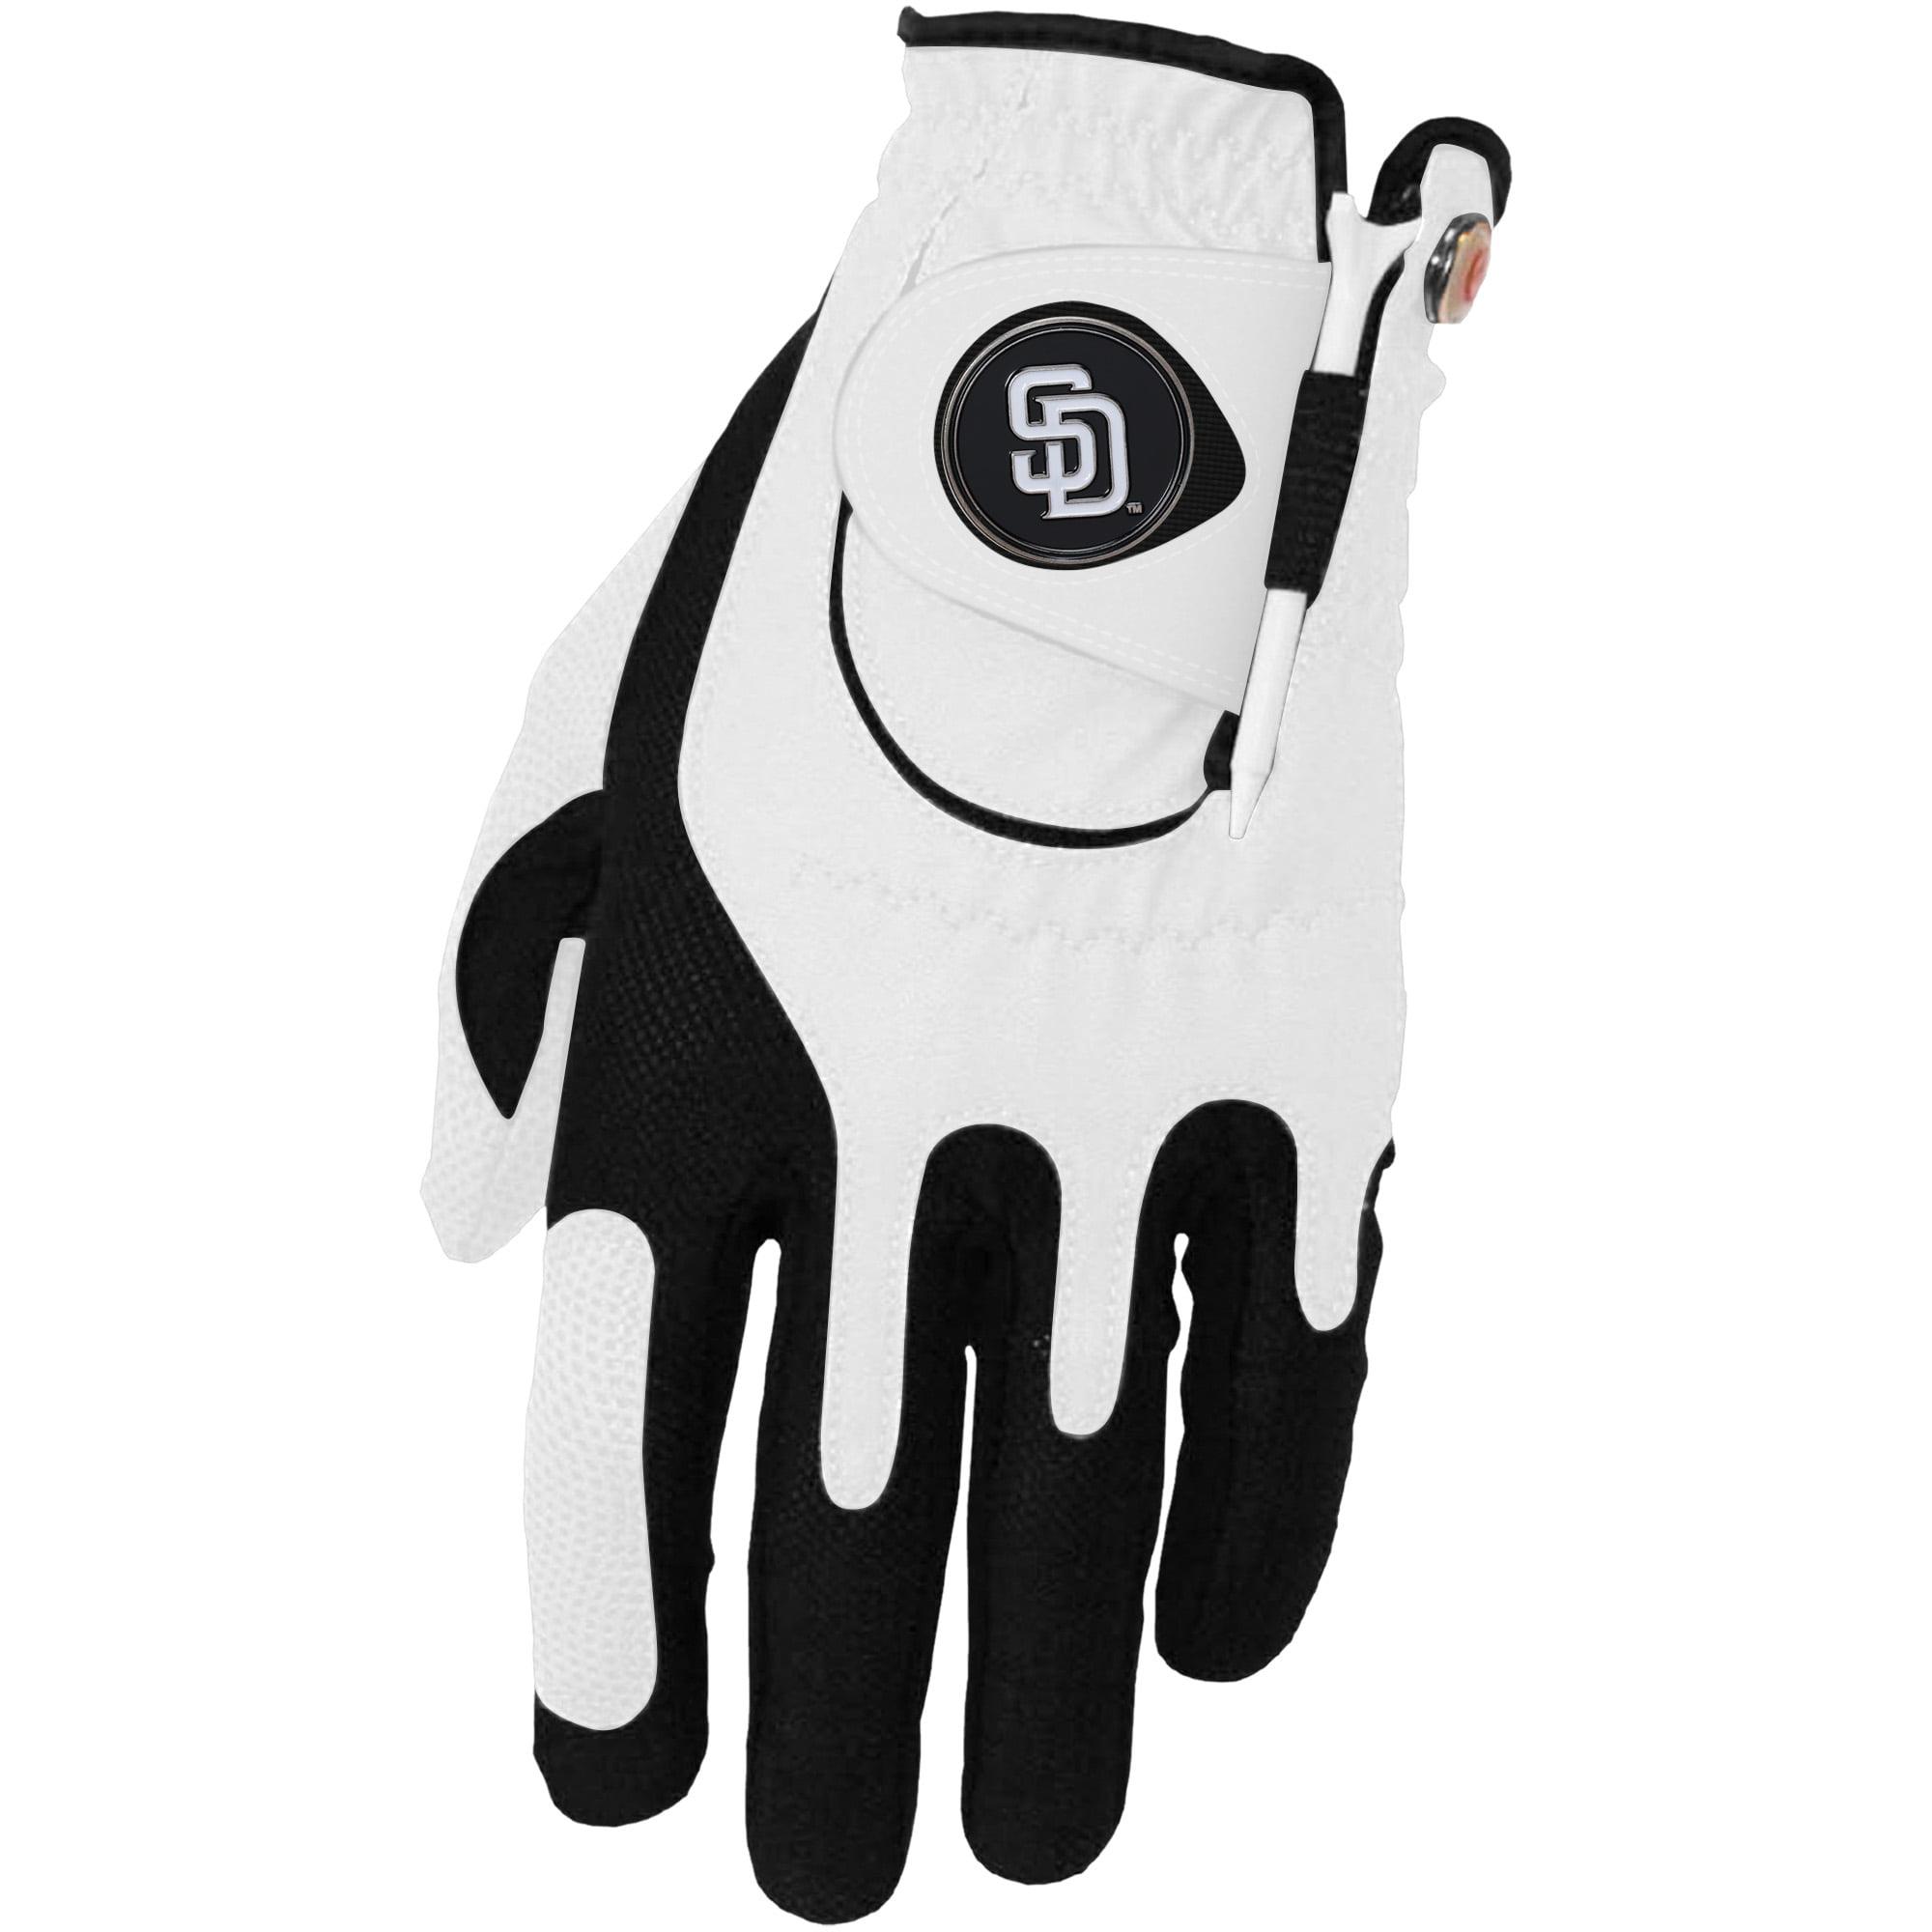 San Diego Padres Left Hand Golf Glove & Ball Marker Set - White - OSFM